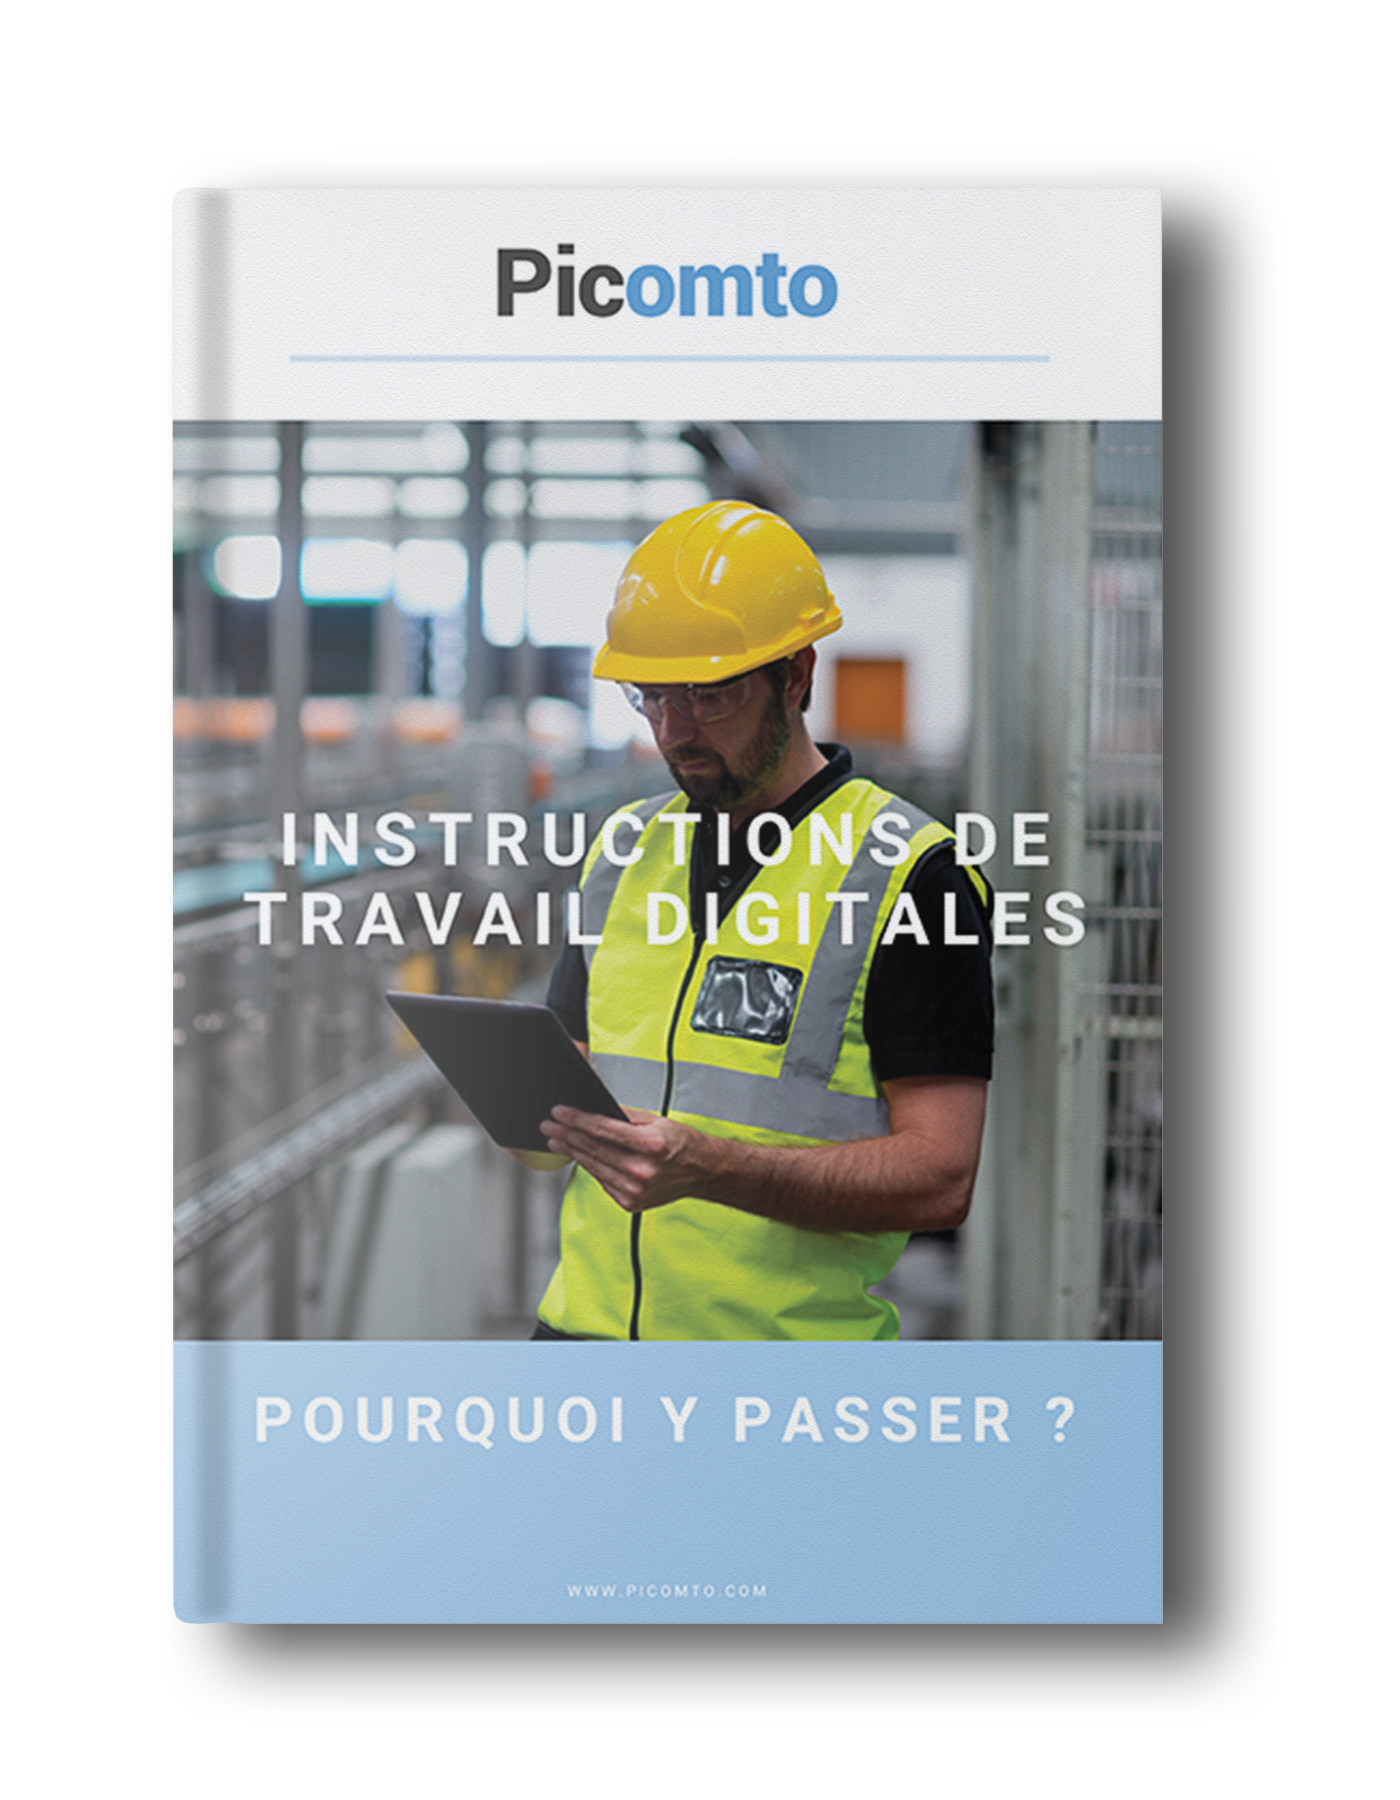 Ebook Picomto - Instructions de travail digitales